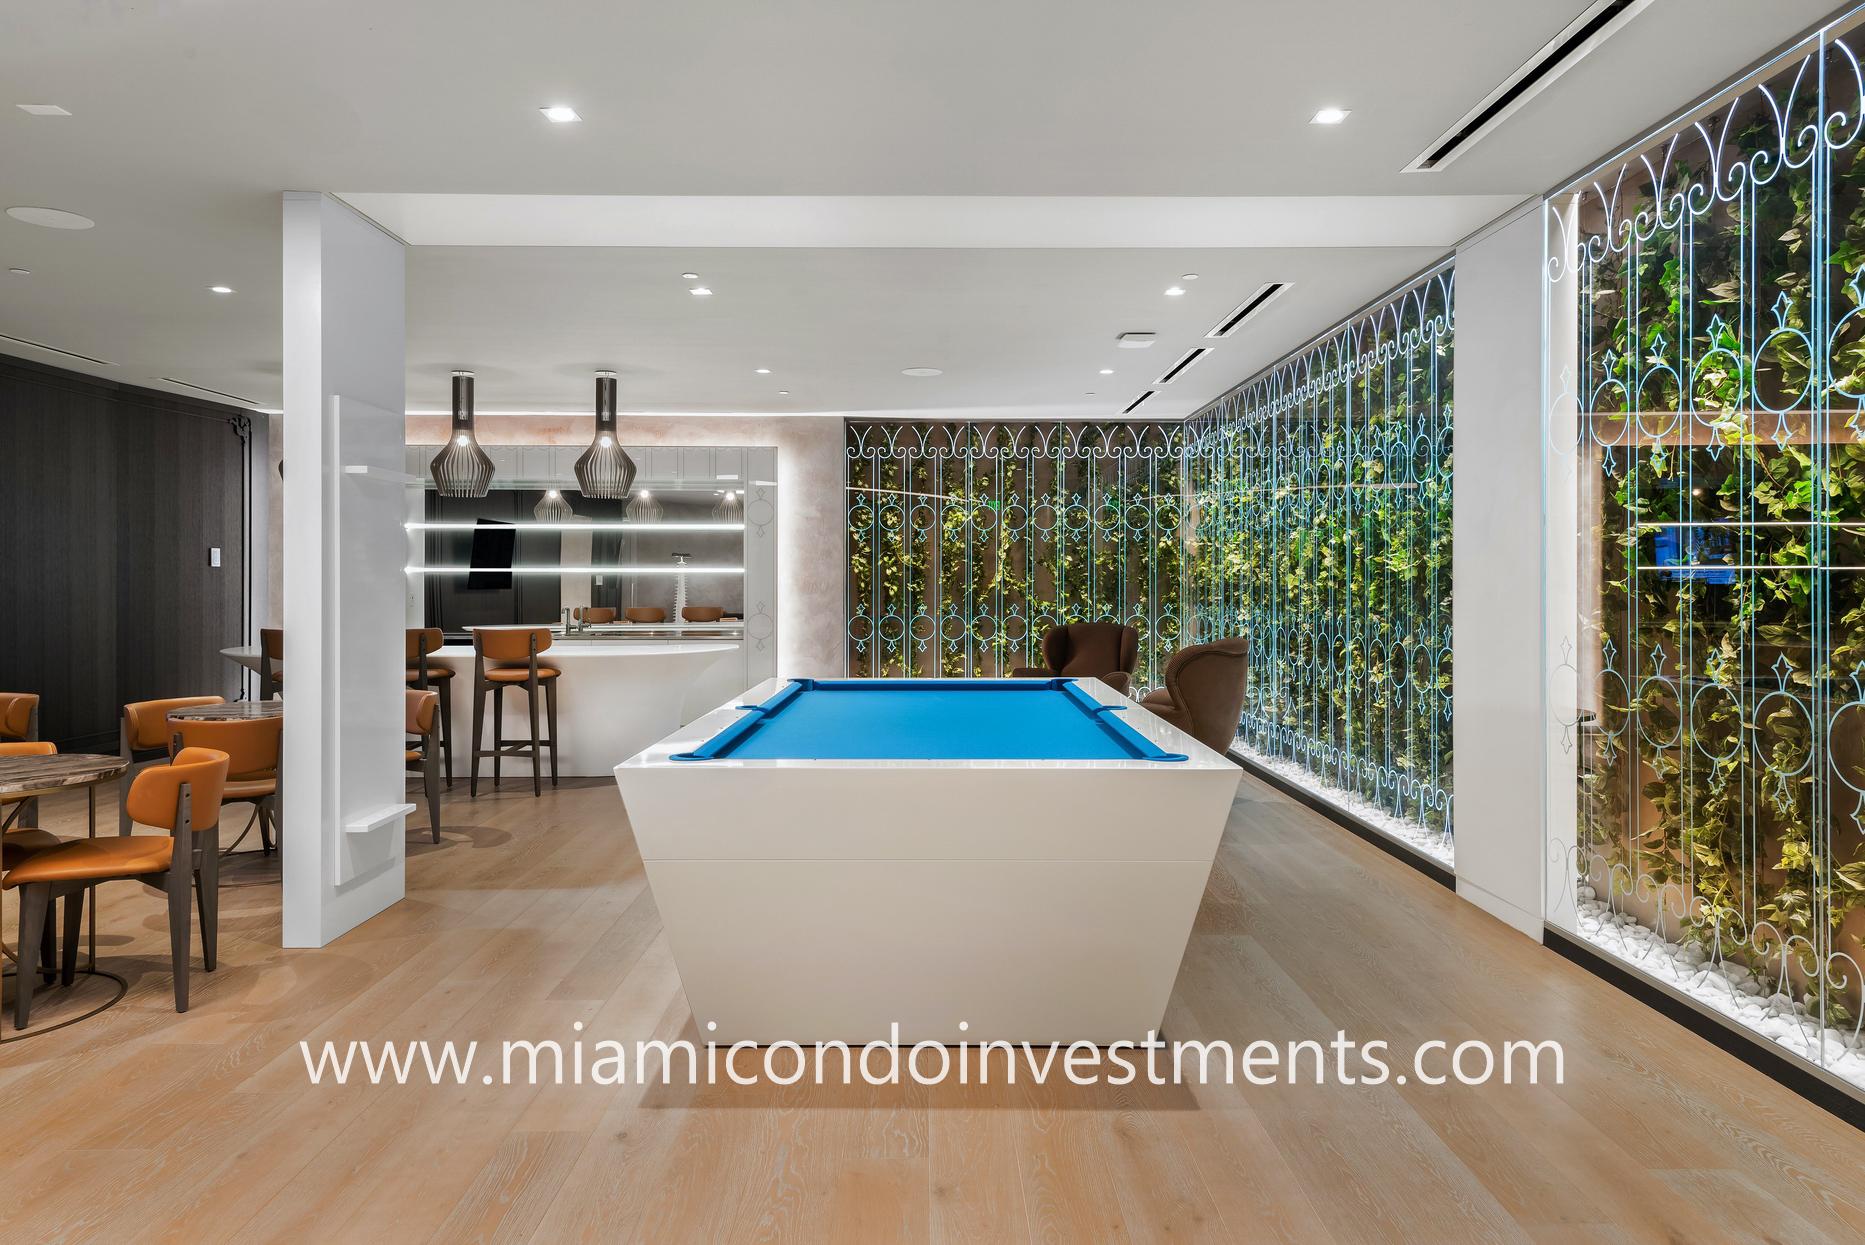 Brickell Flatiron billiards room